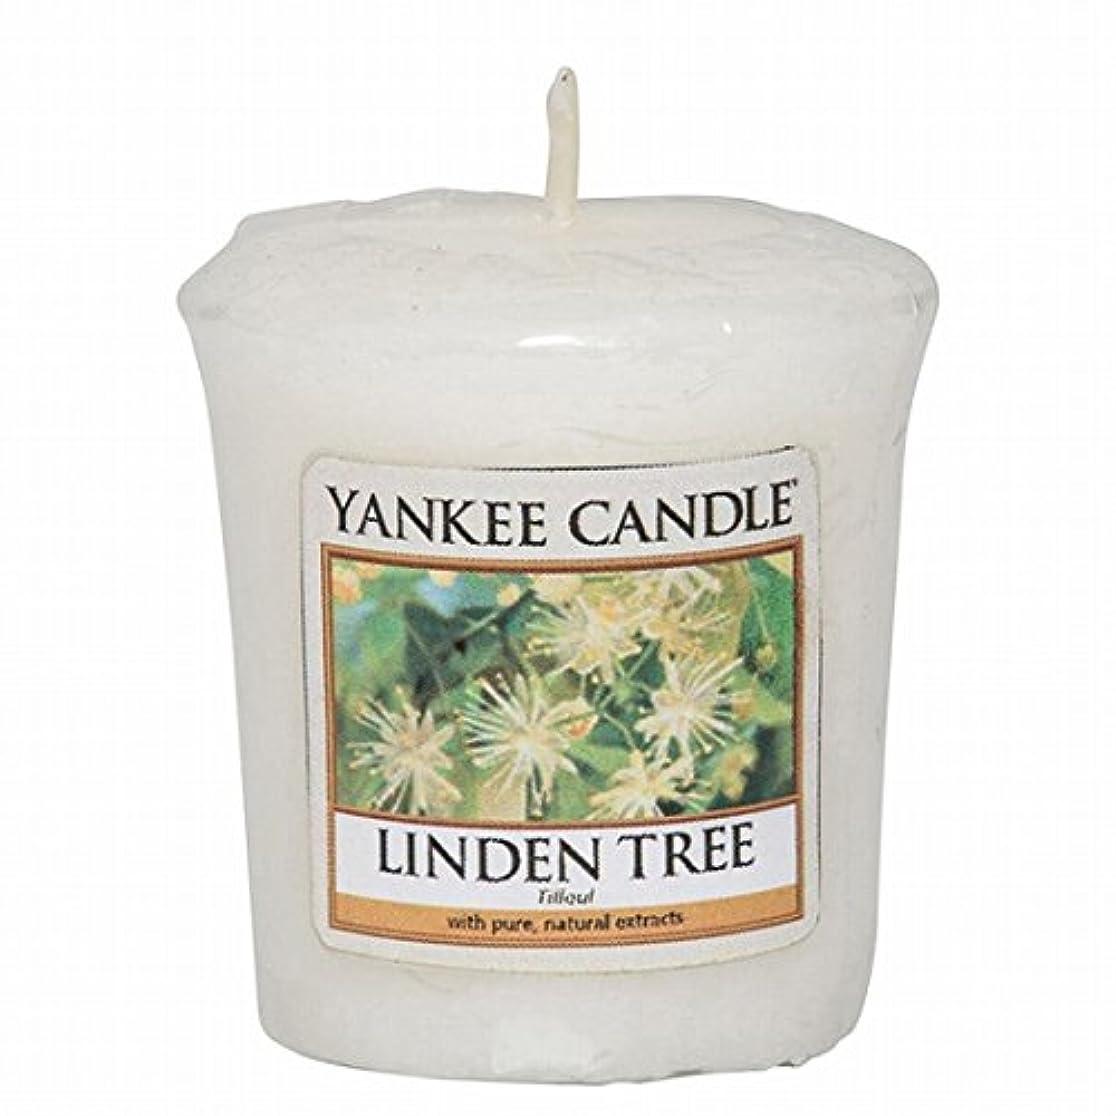 YANKEE CANDLE(ヤンキーキャンドル) YANKEE CANDLE サンプラー 「リンデンツリー」(K00105289)